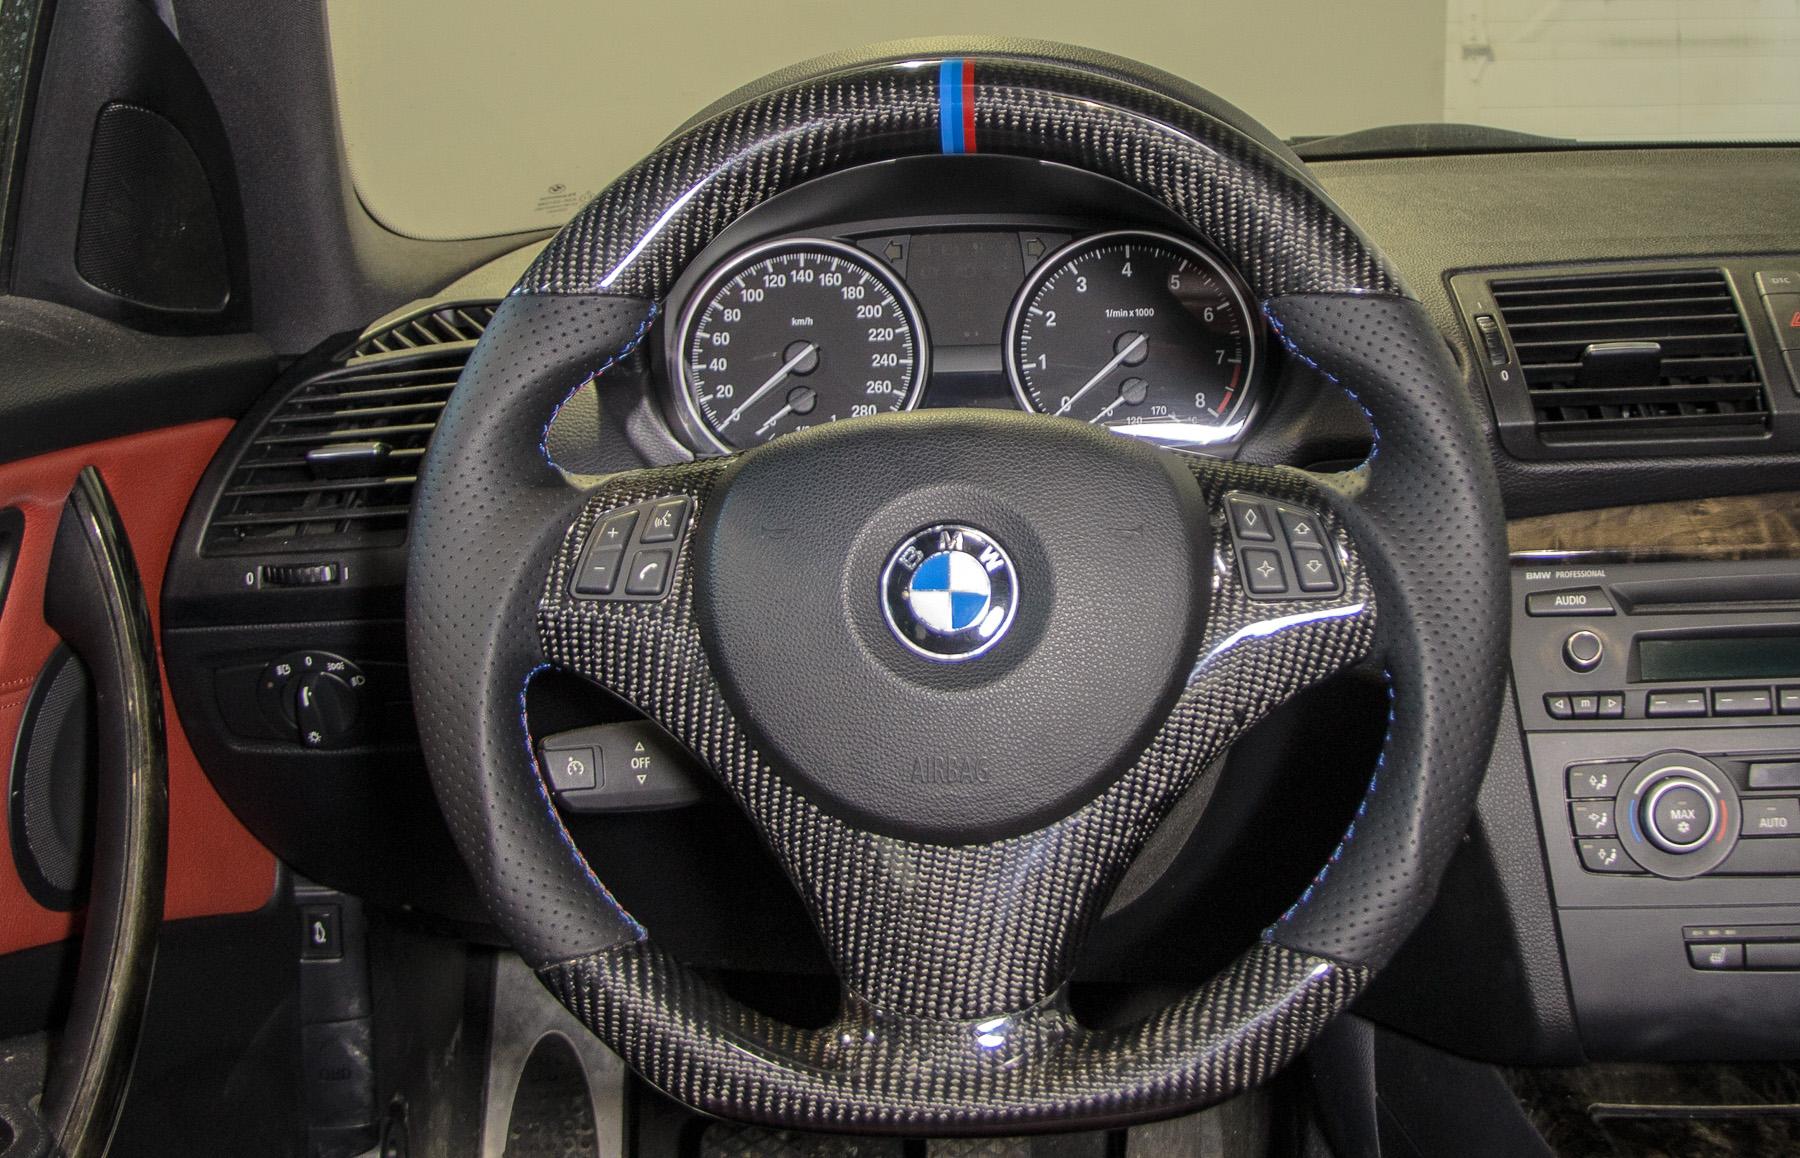 BMW-E92-cf-steering-wheel-5.jpg